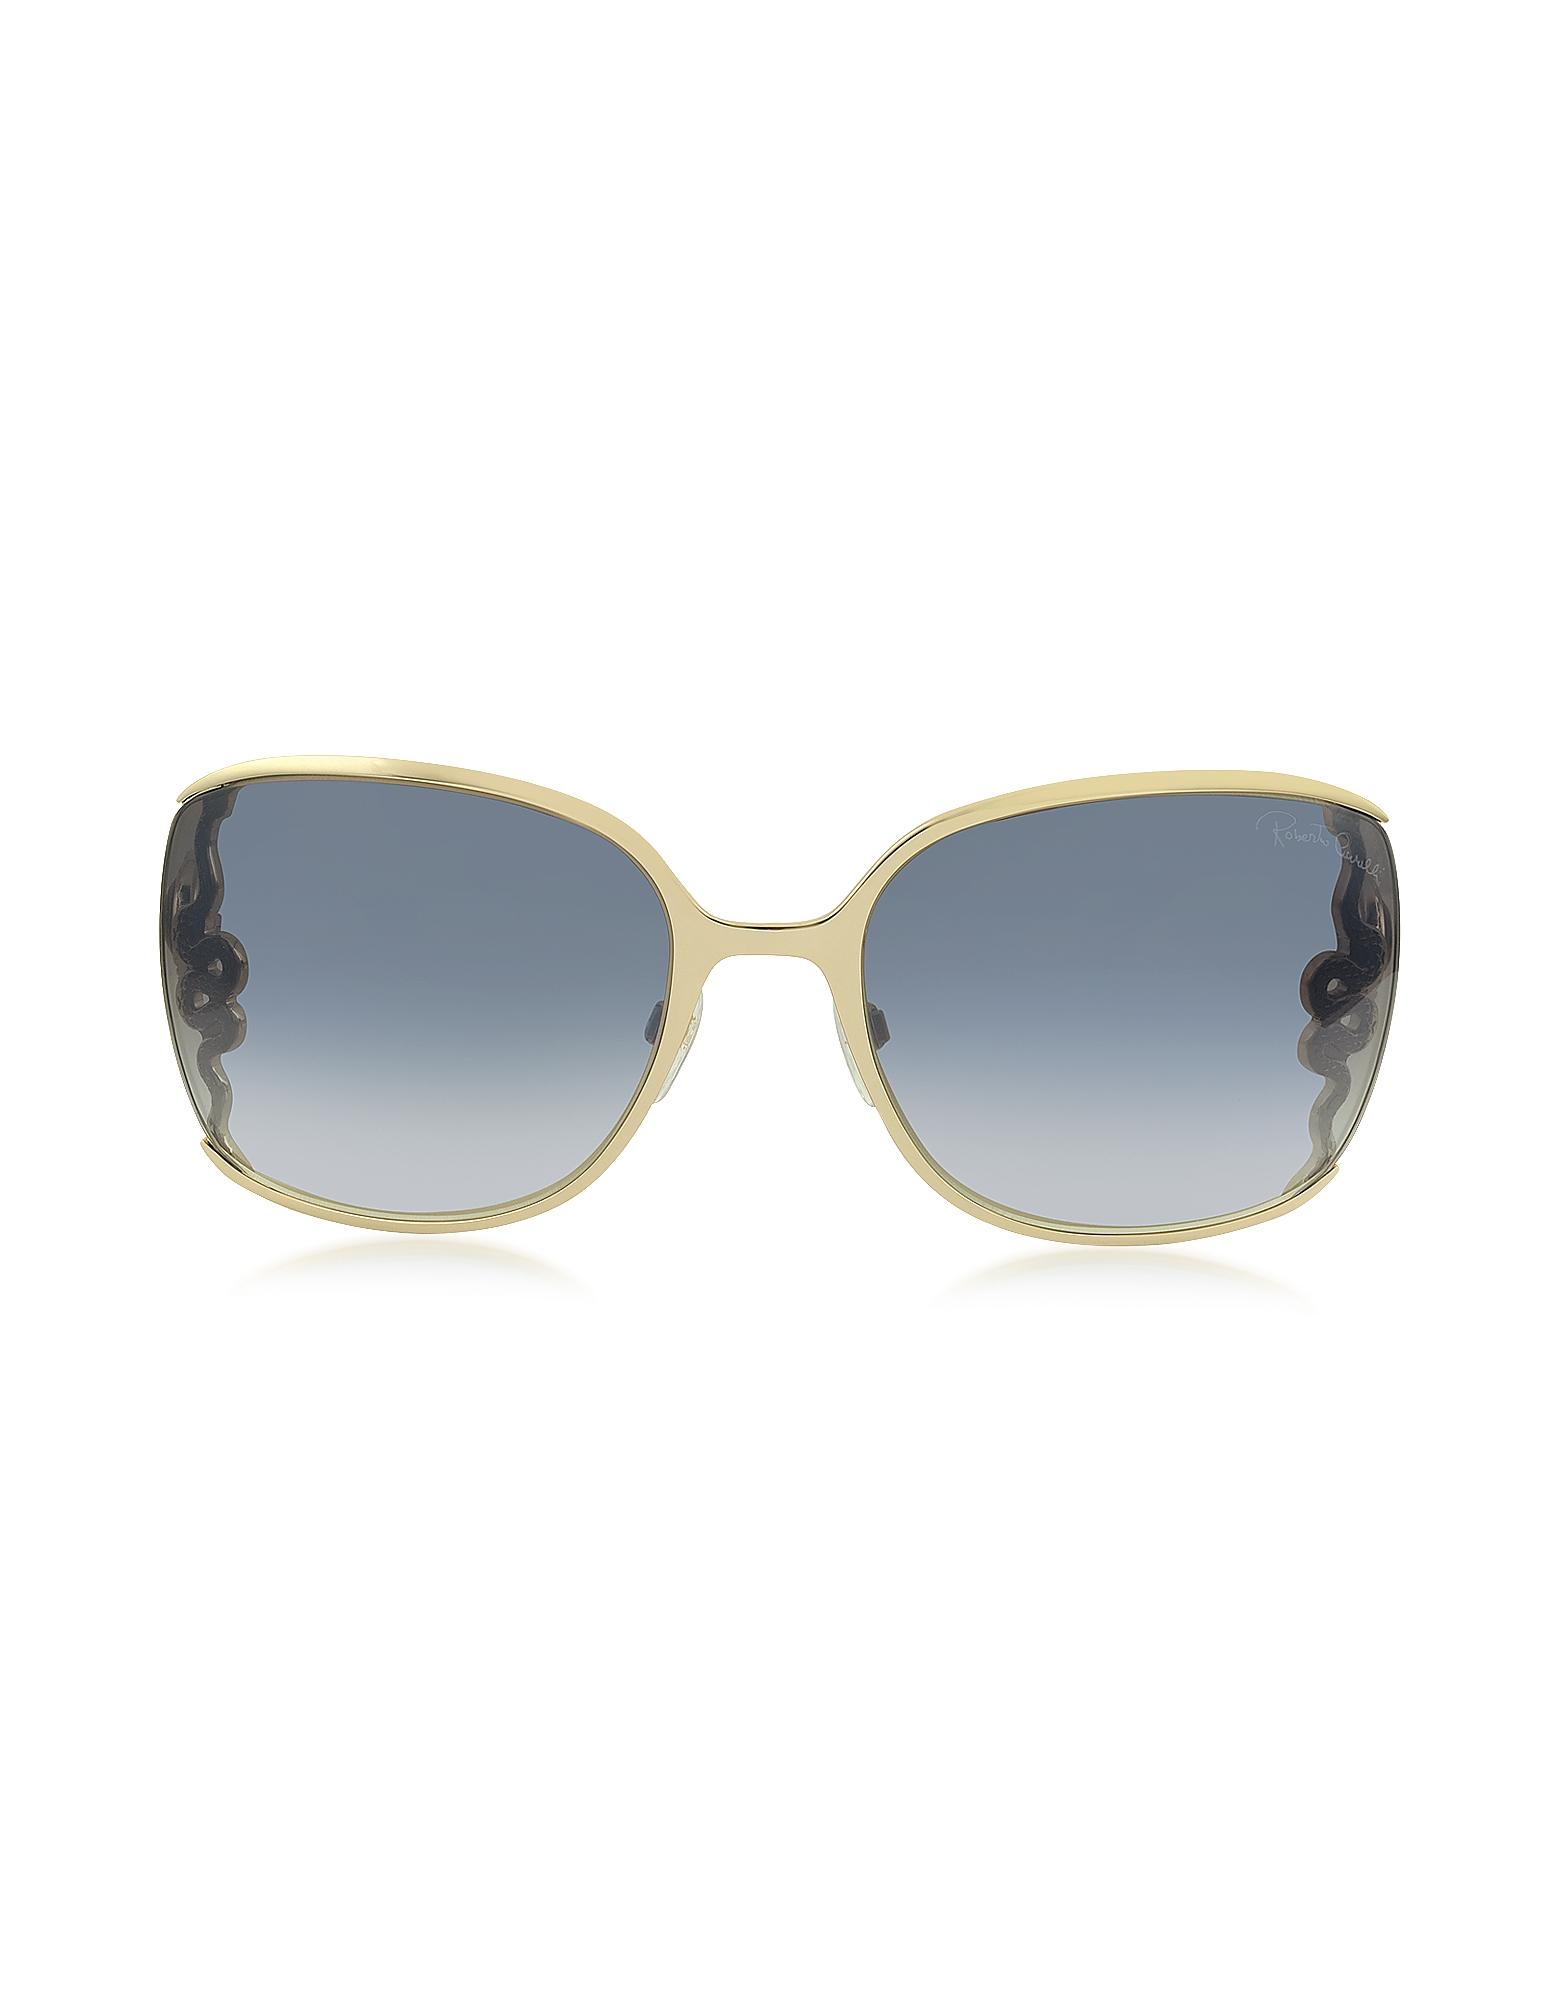 Roberto Cavalli Sunglasses, WASAT 1012 Metal Square Oversized Women's Sunglasses